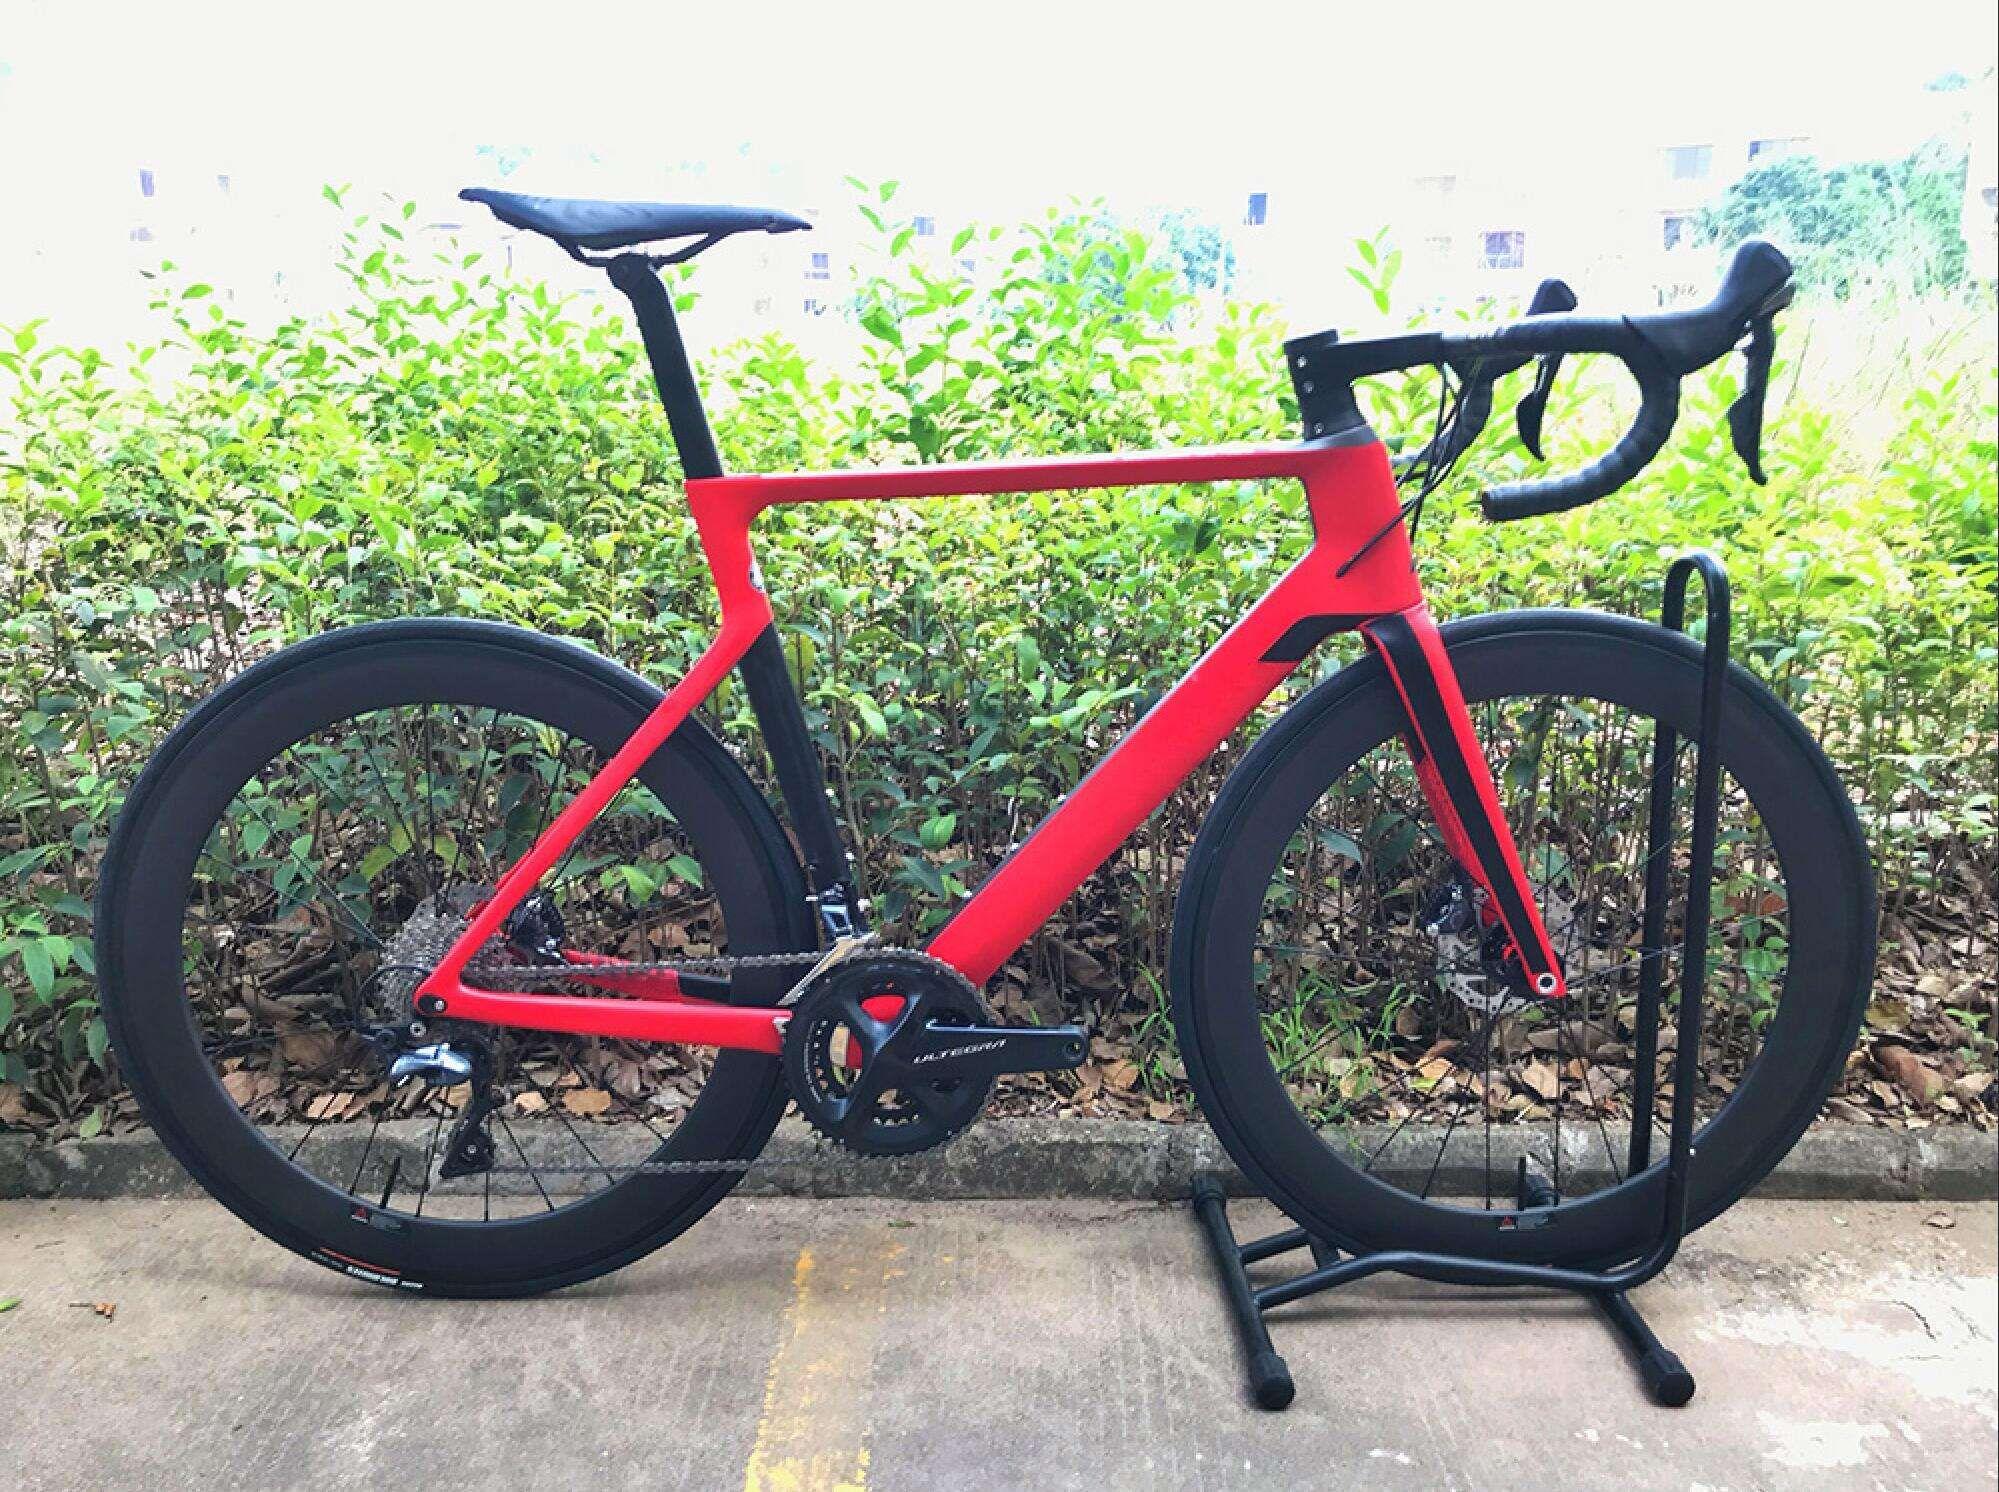 2019 carbon straße DISC fahrrad komplette fahrrad carbon BICICLETTA fahrrad mit fahrrad gruppe R8000 R7000 carbon räder